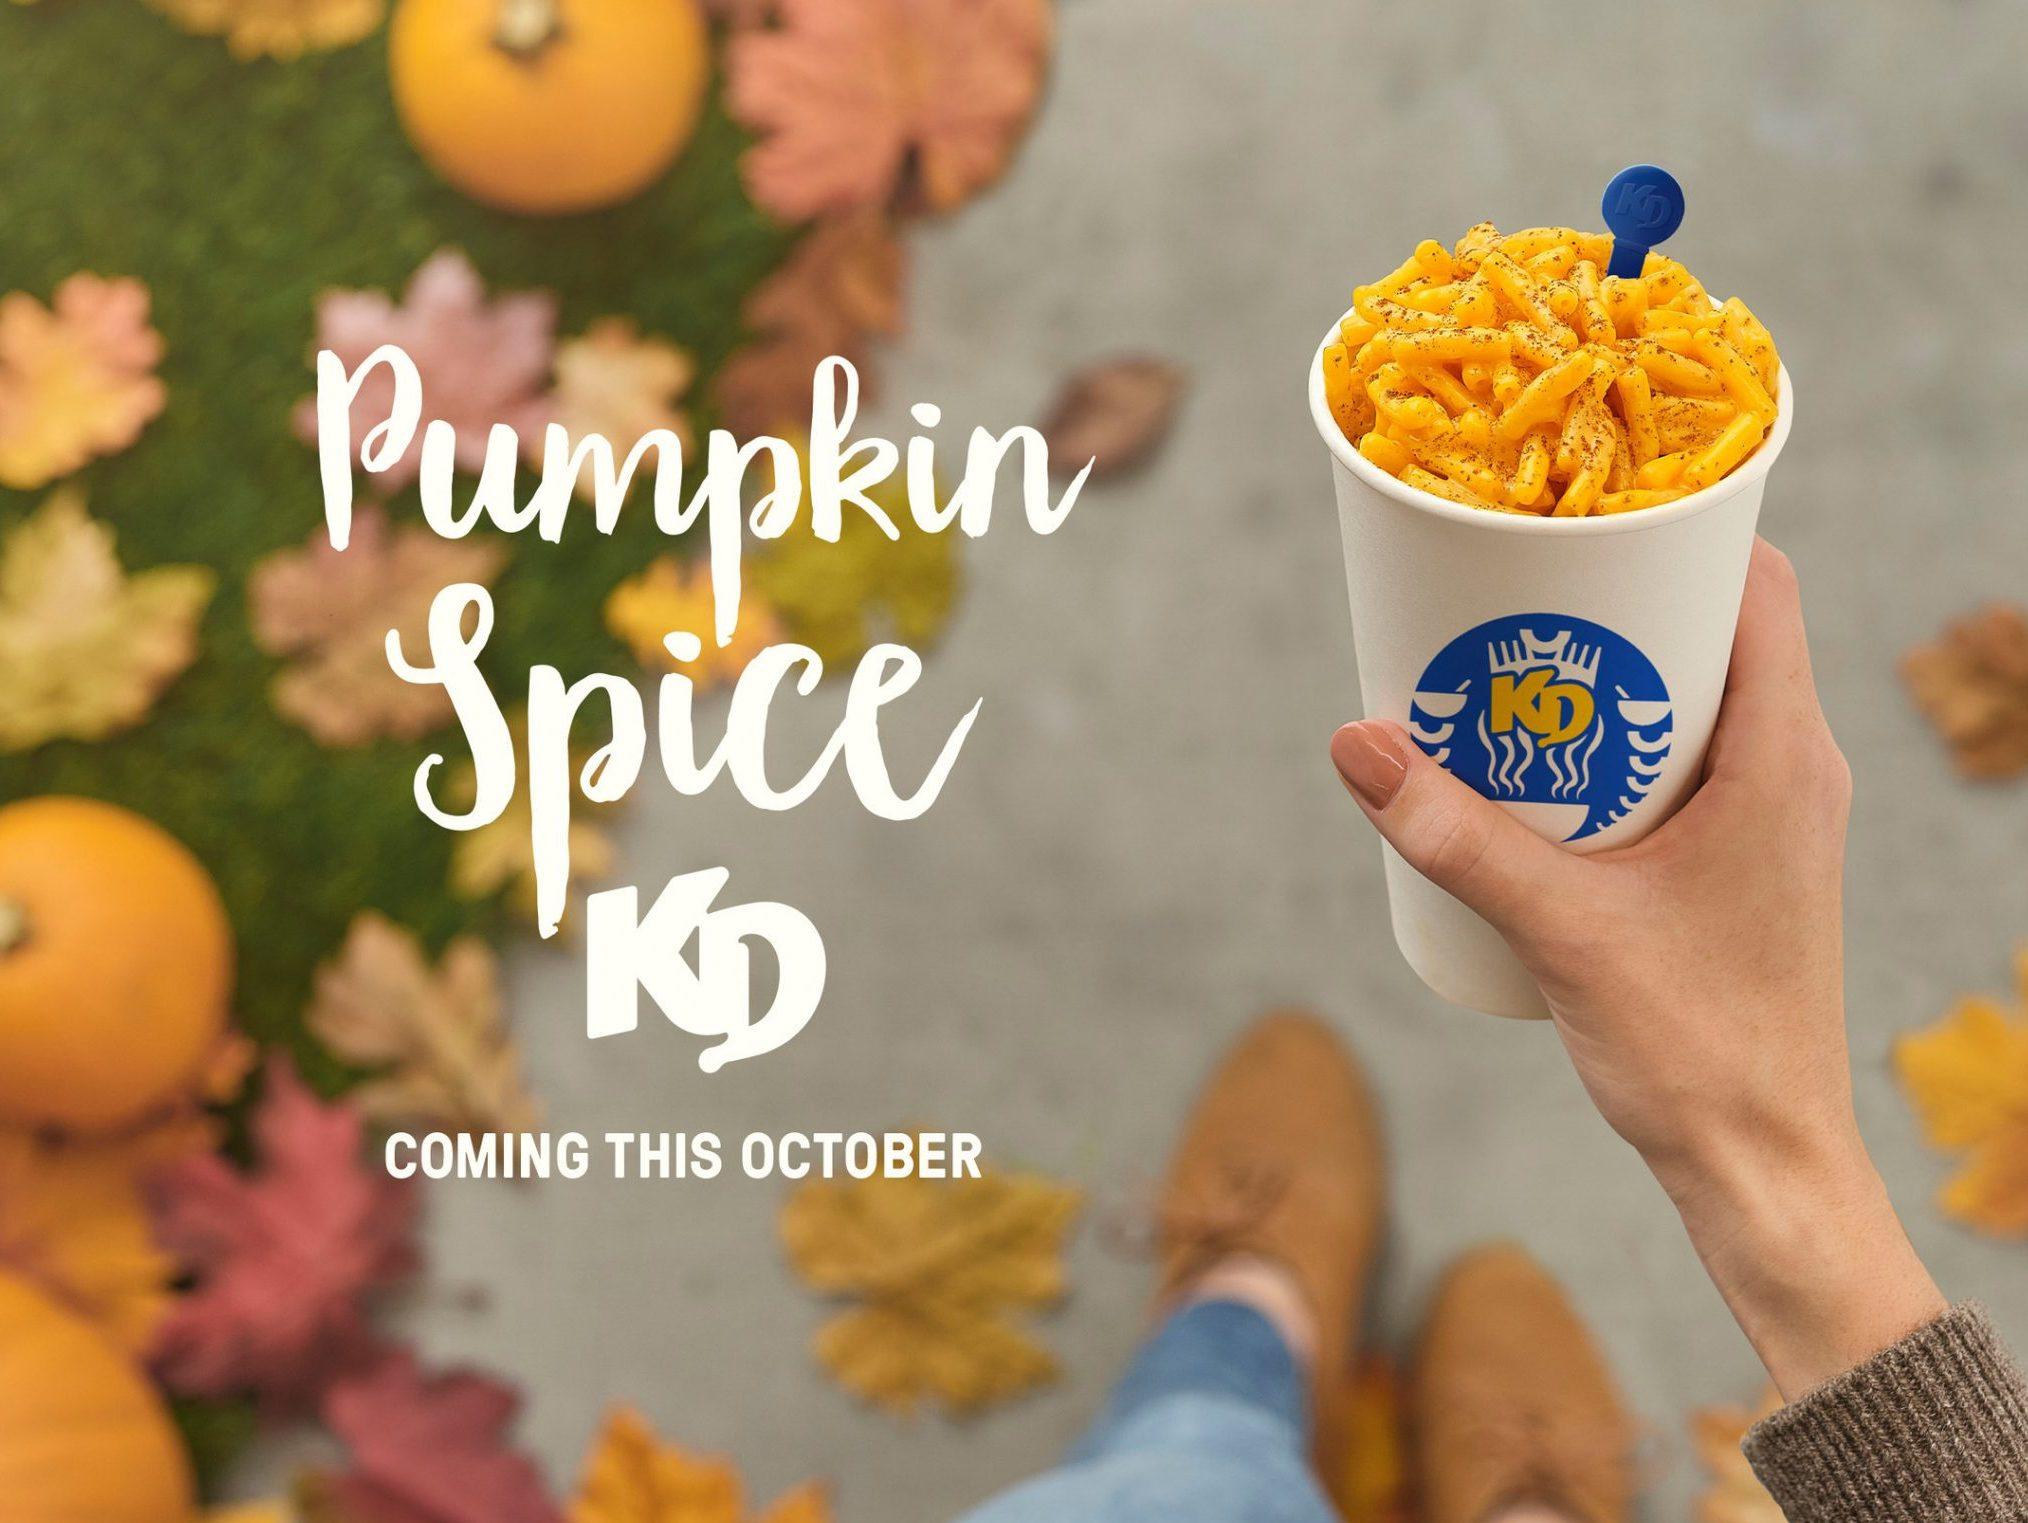 Kraft Dinner Releasing Limited Edition Pumpkin Spice Kd photo